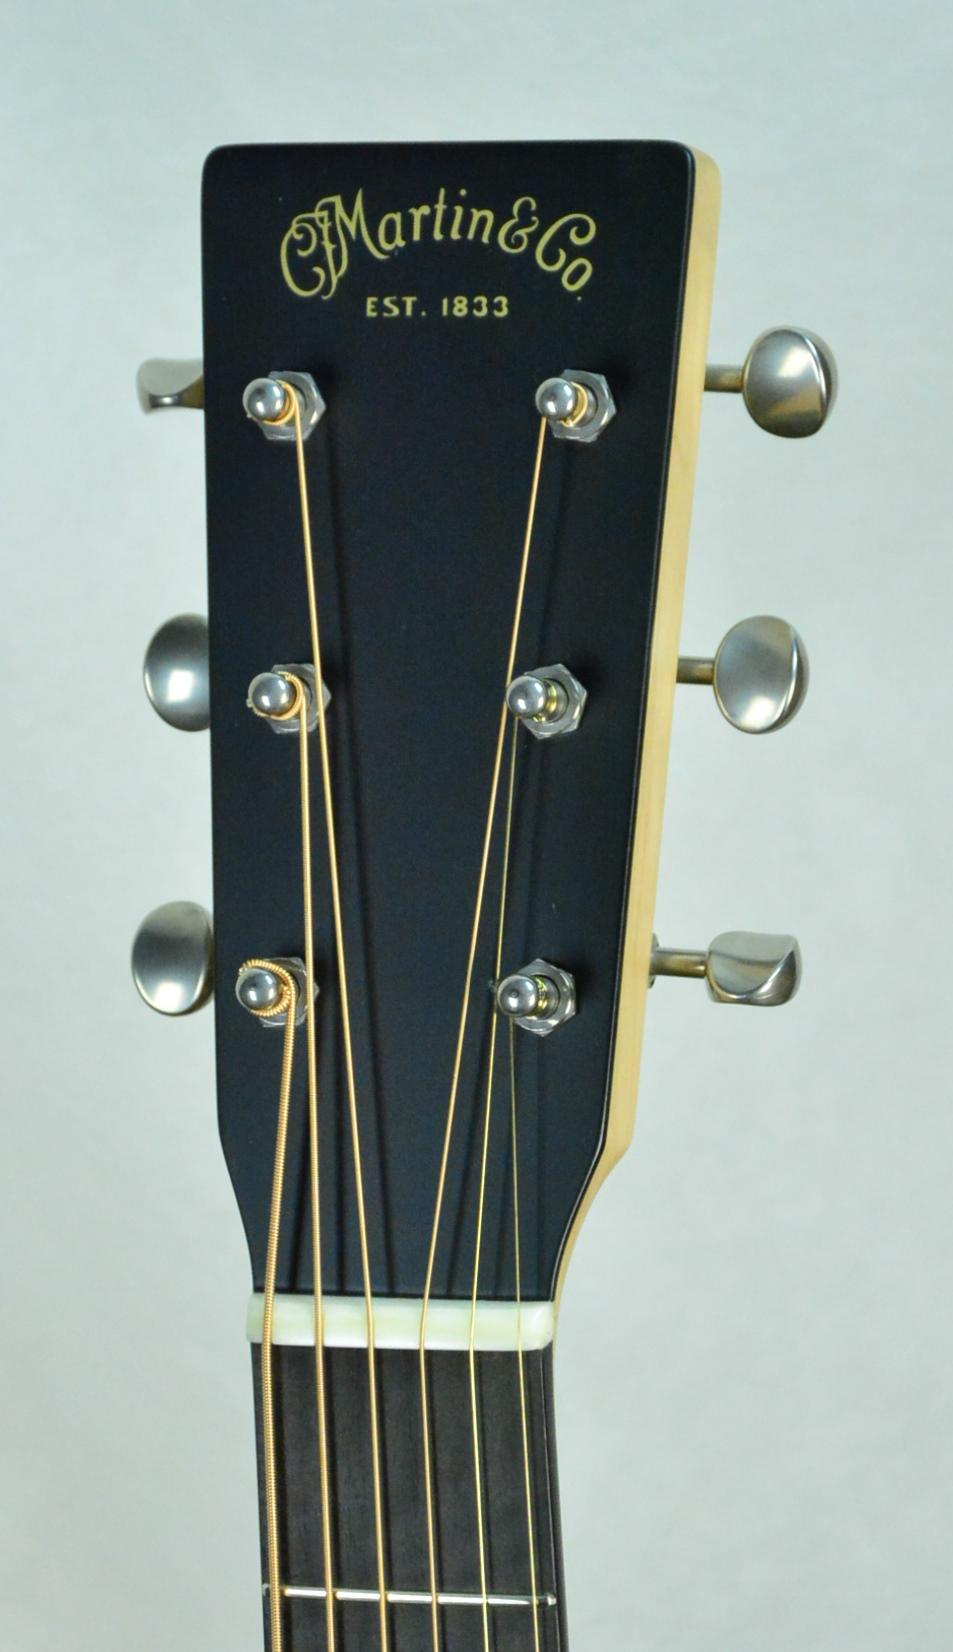 Q-2648024 S-1928826 OM Black Walnut- Maple Neck (4).JPG